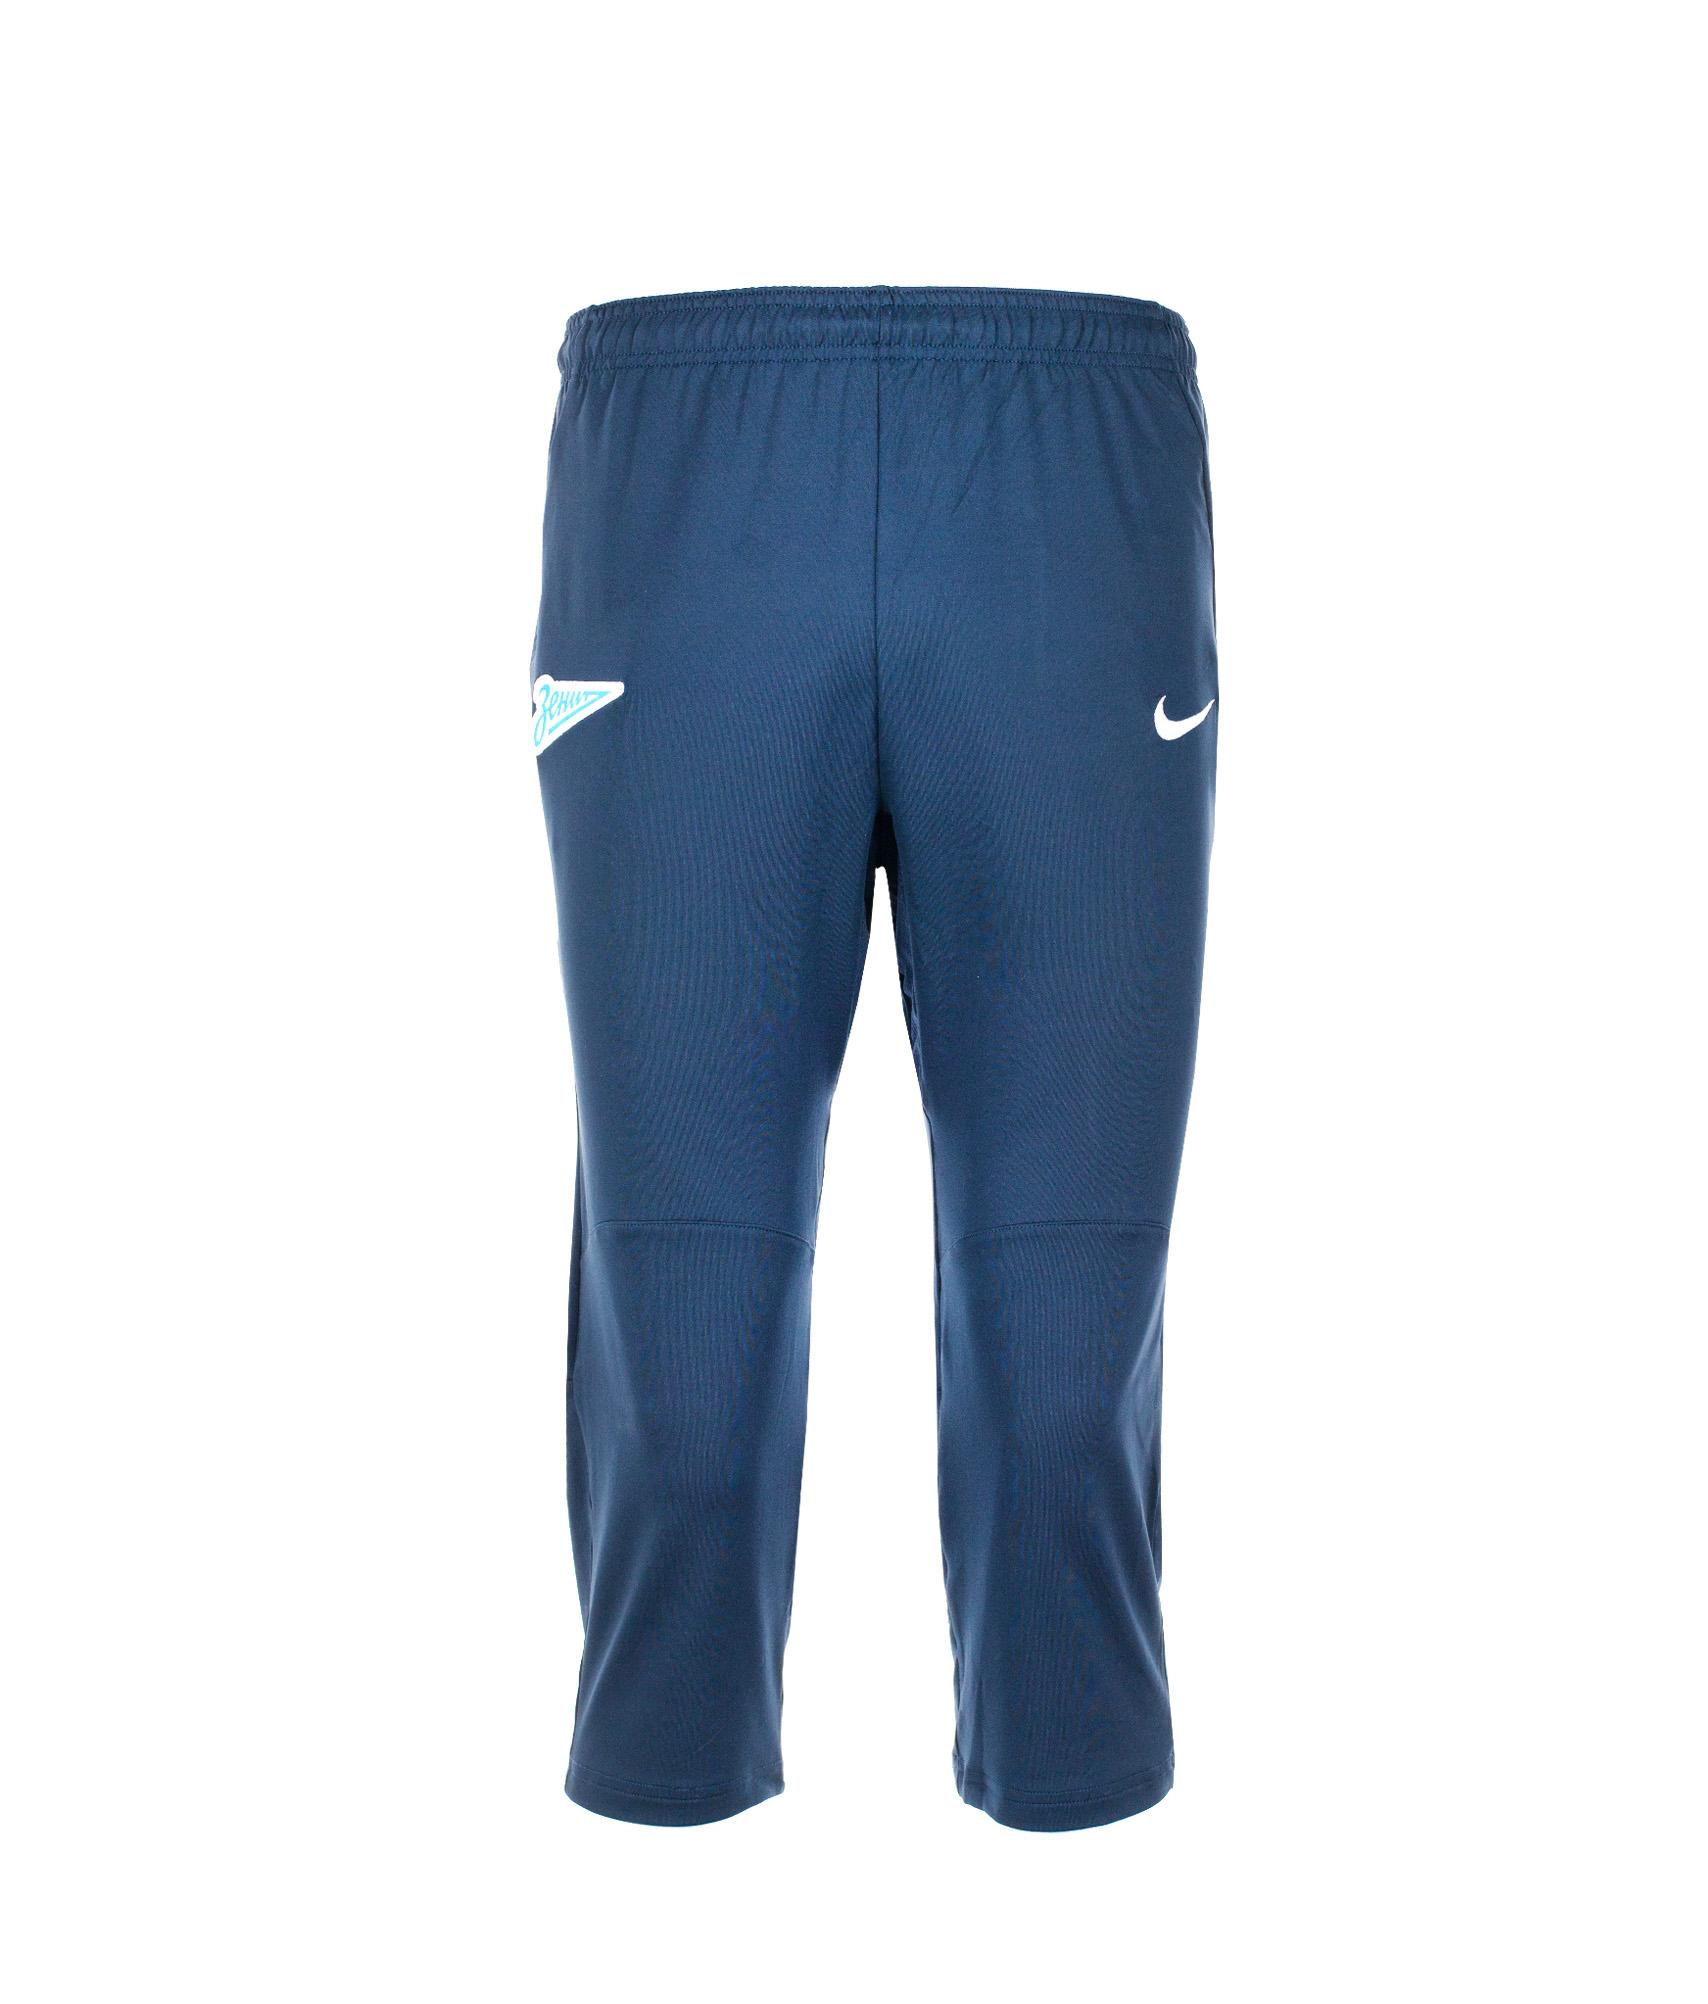 Брюки Nike Zenit Select 3/4 Tech Pant, Цвет-Синий, Размер-L